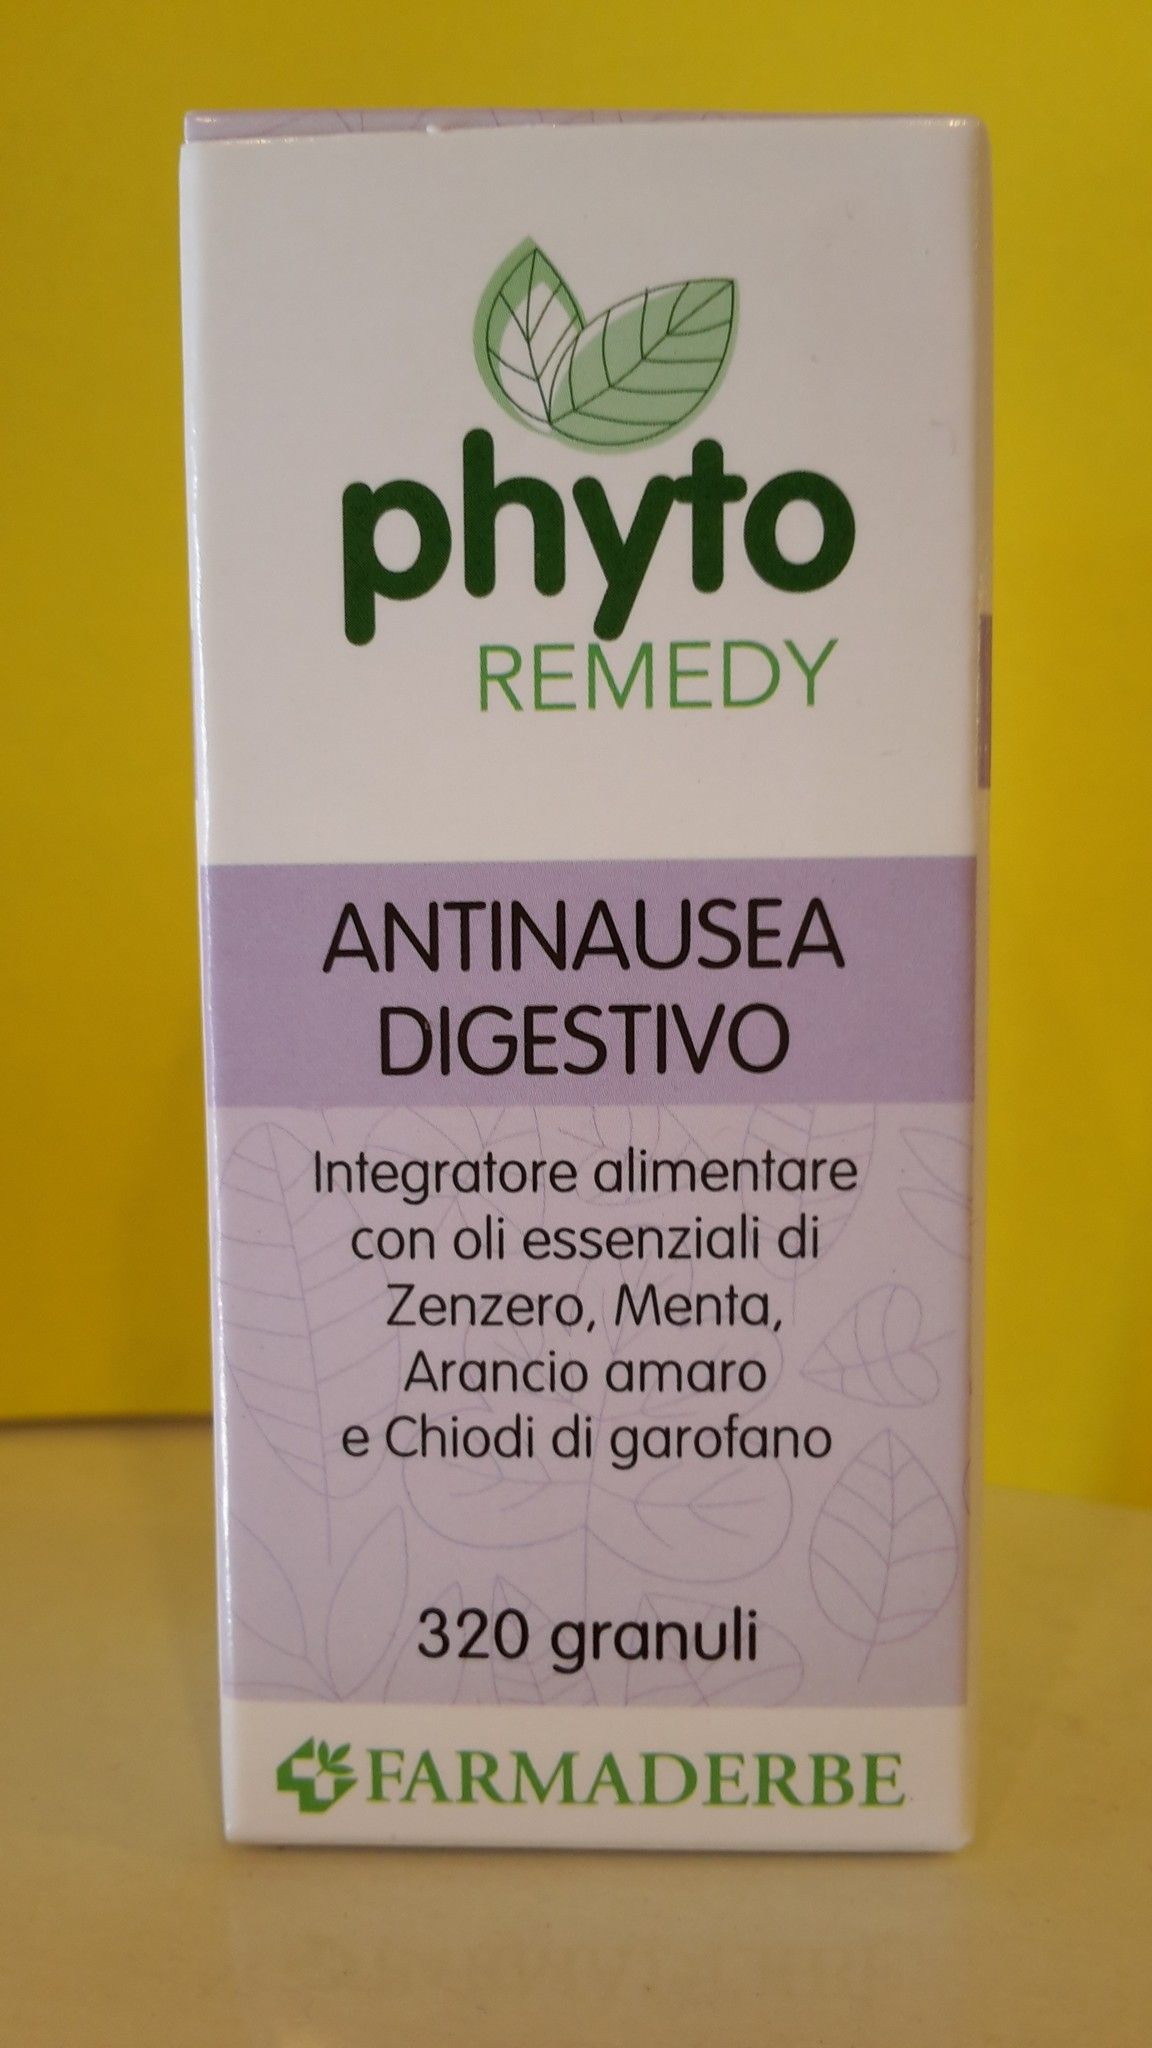 Phyto Remedy ANTINAUSEA  digestivo  320 granuli - FARMADERBE